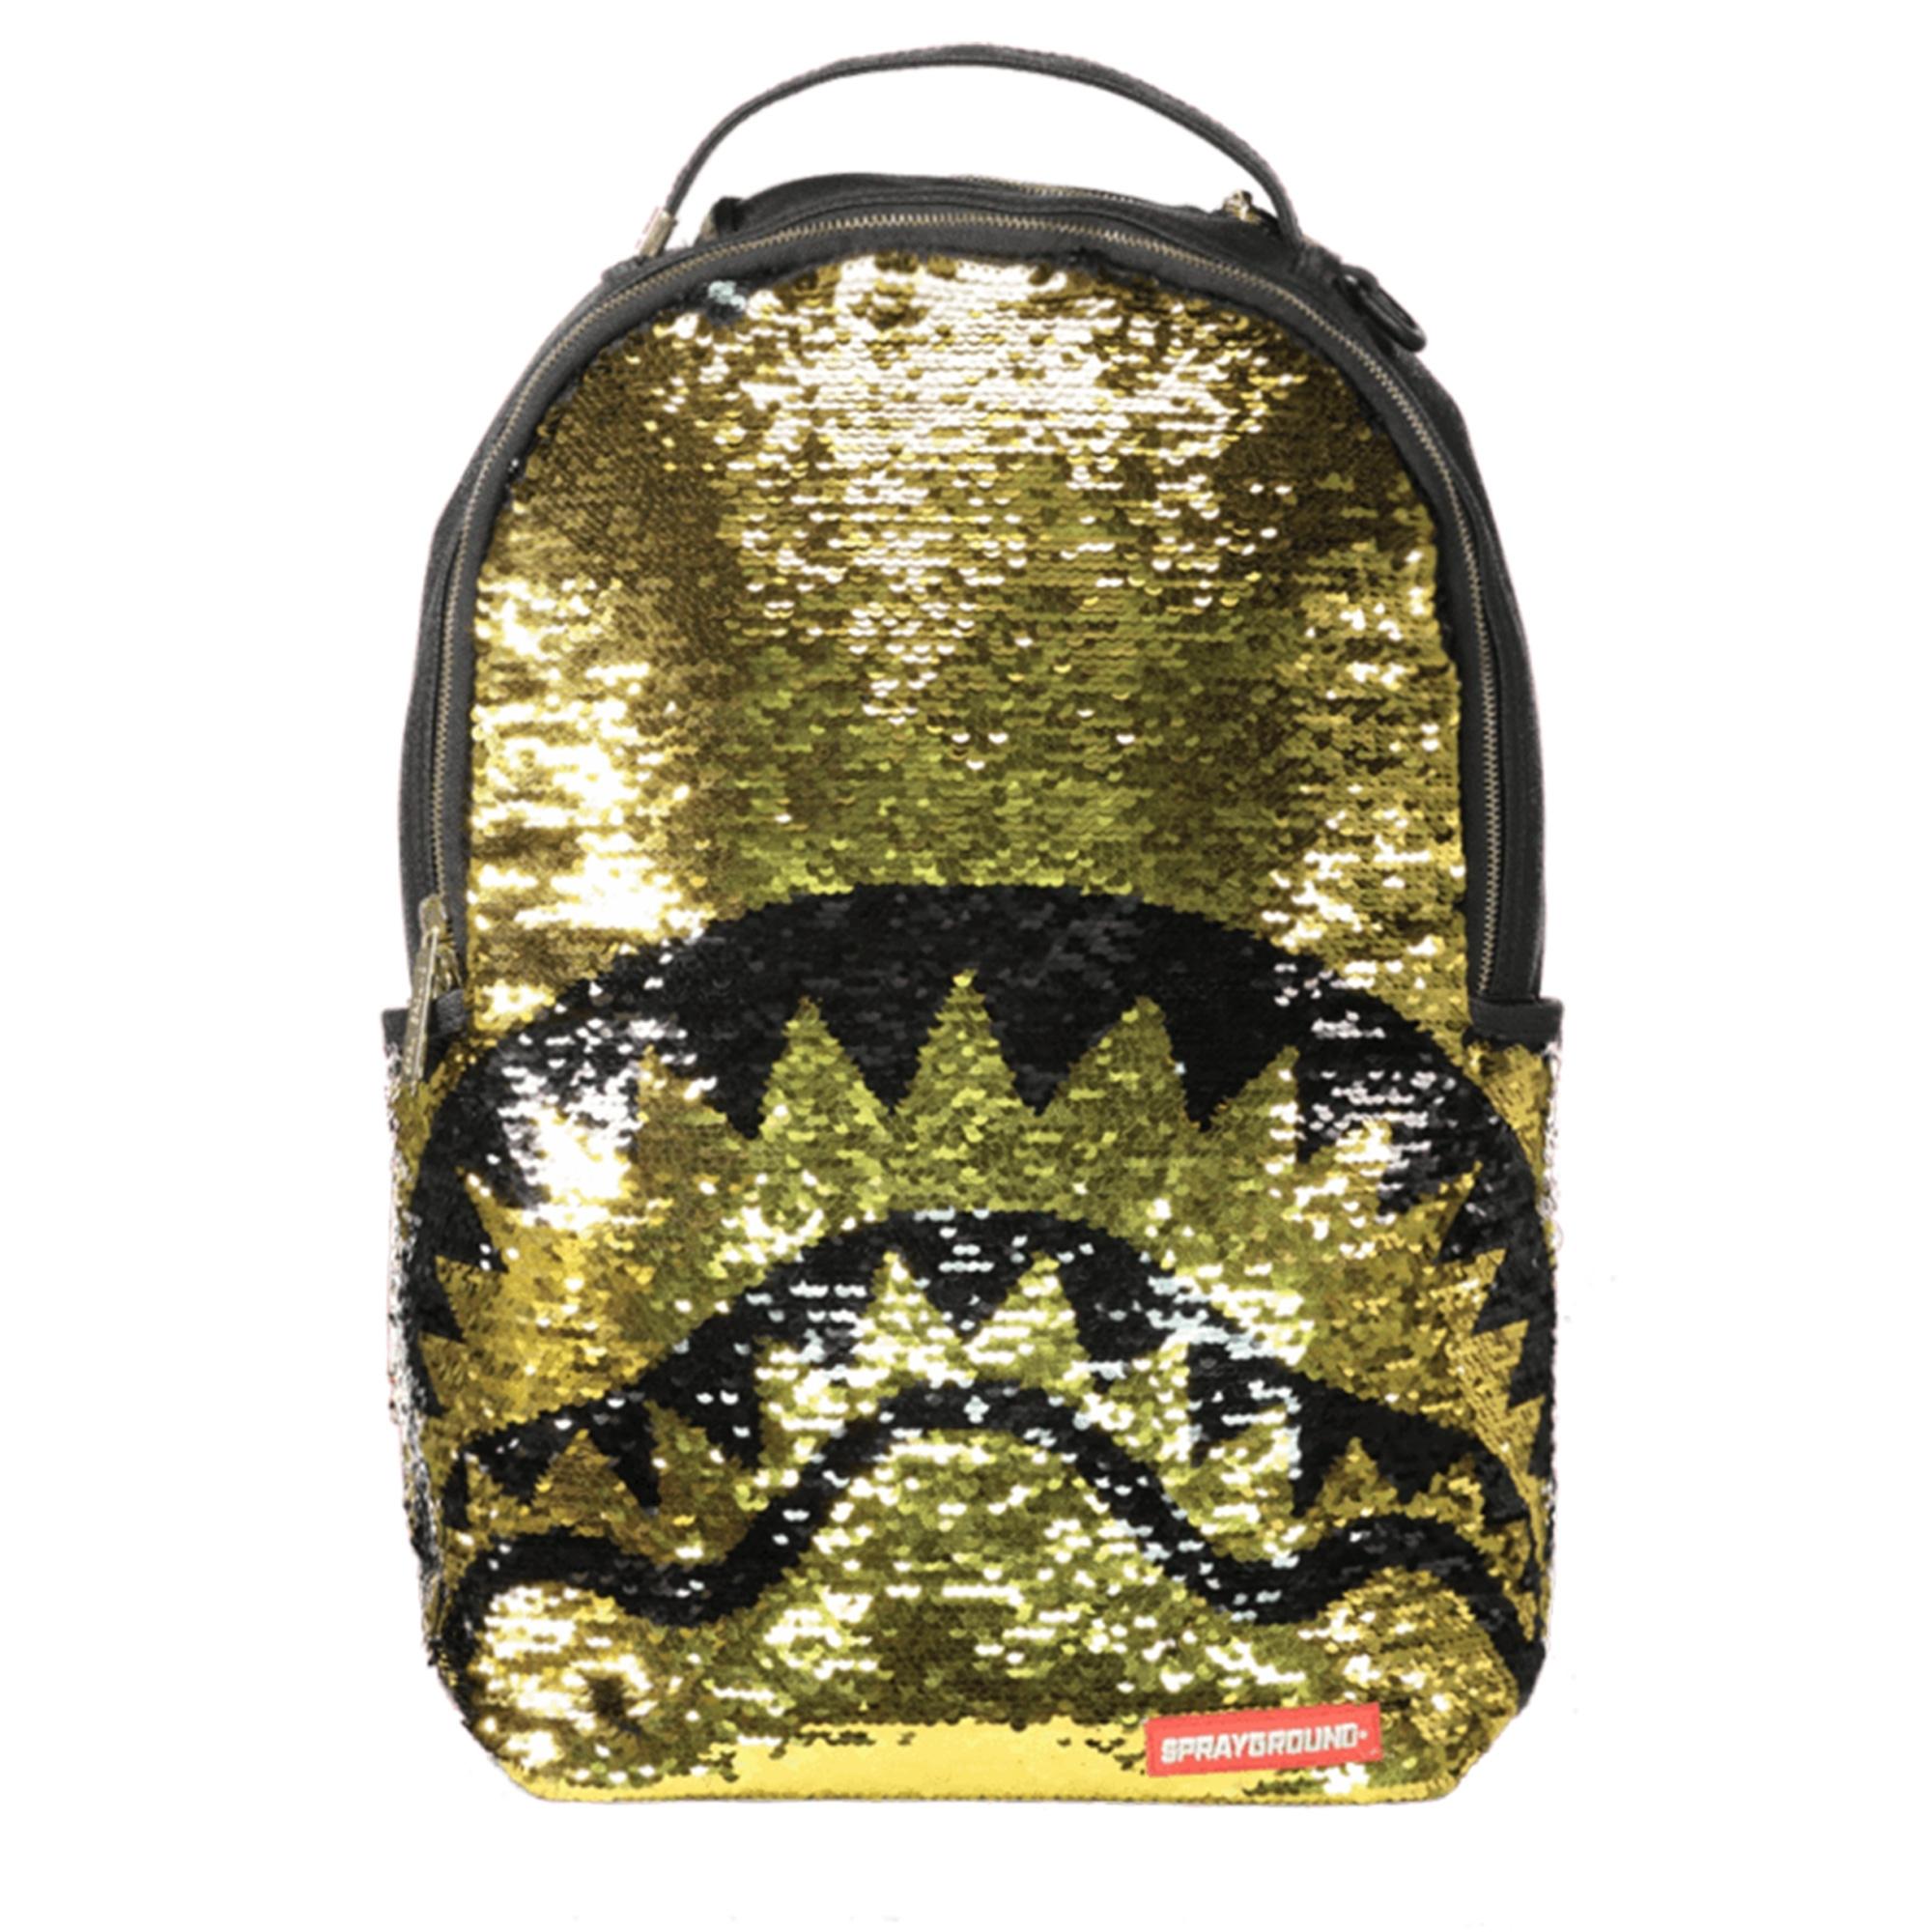 64de4ff5c5b Sprayground Gold Sequin Shark Backpack